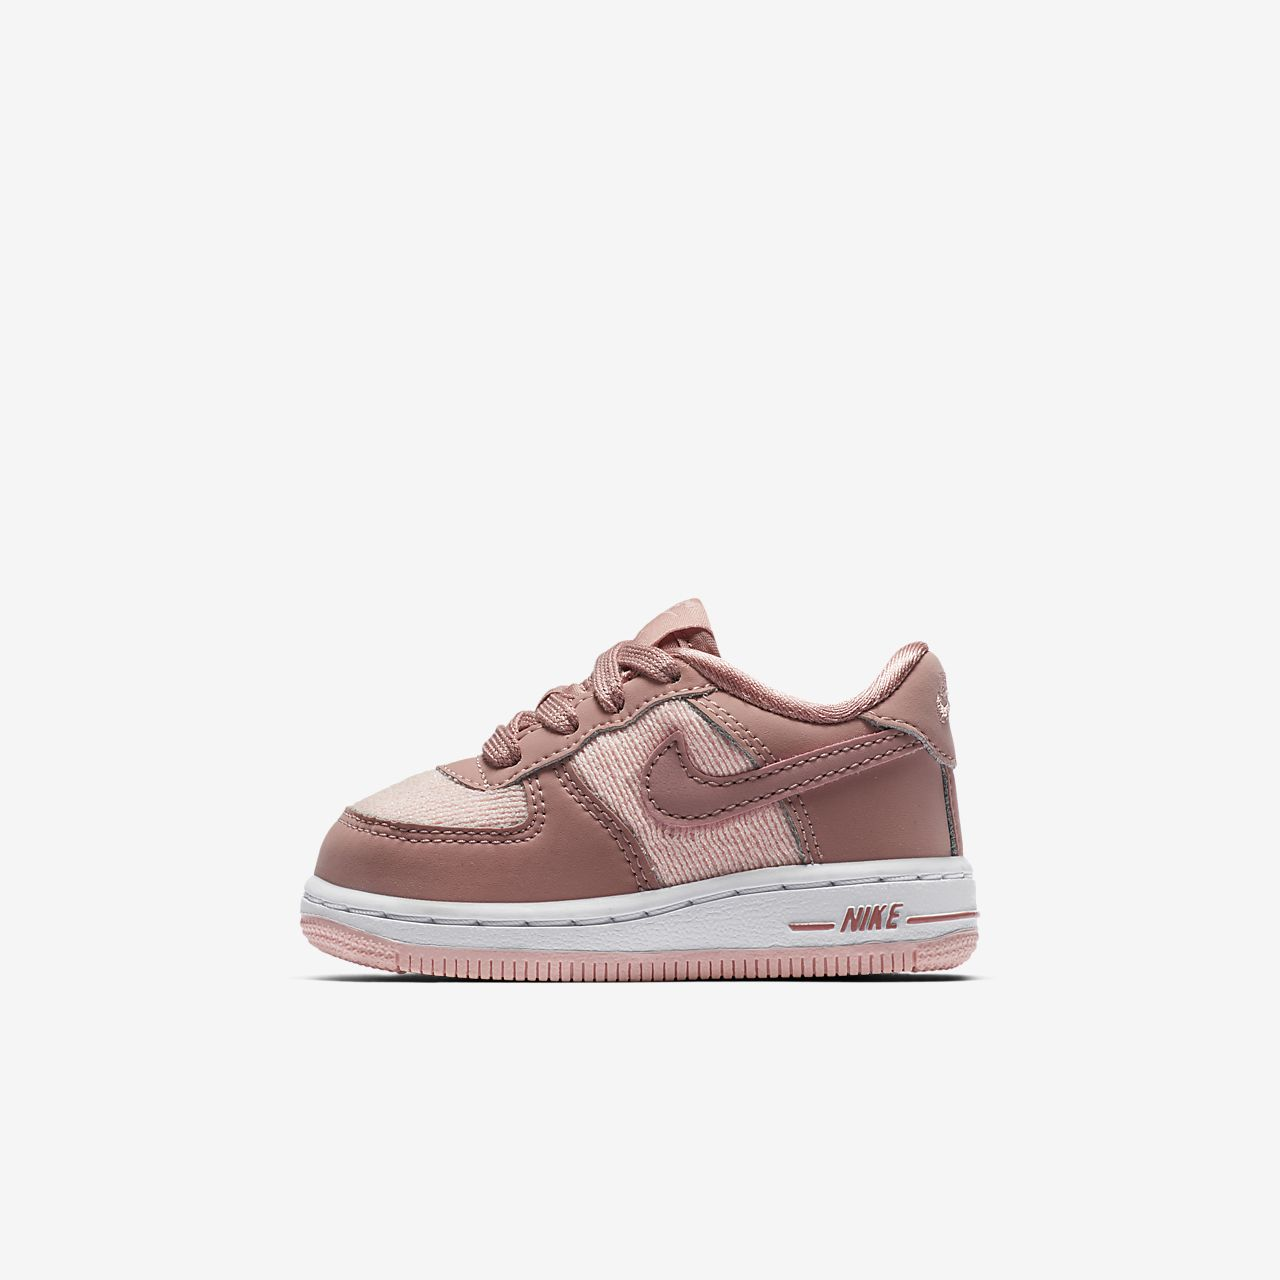 Nike Air Force 1 LV8 Baby & Toddler Shoe